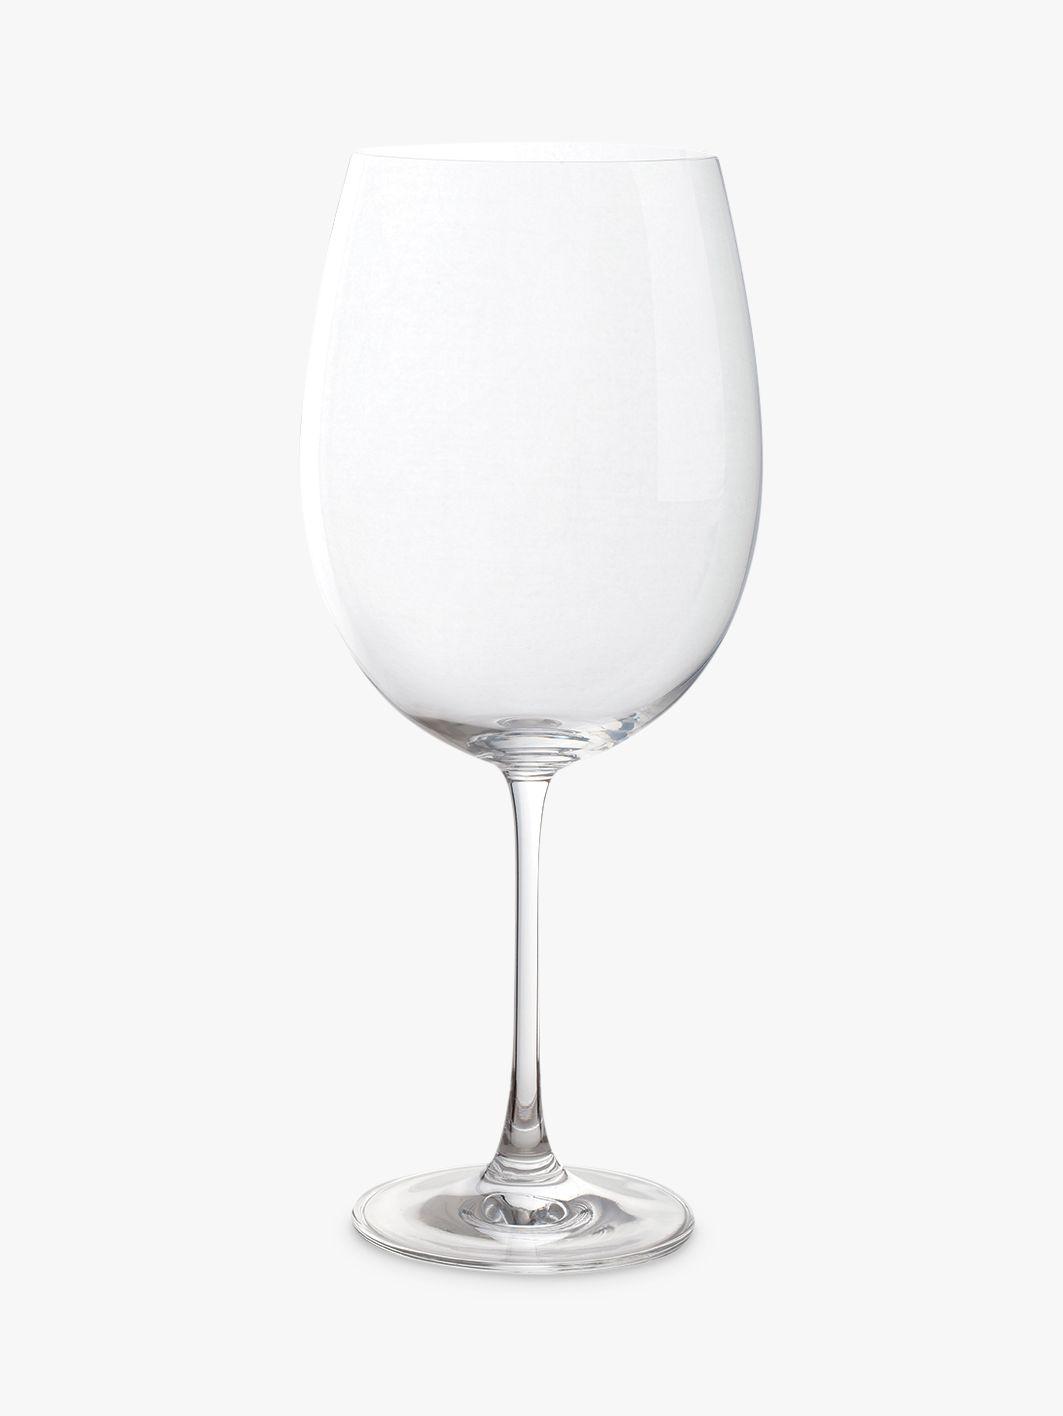 Dartington Crystal Dartington Crystal Just The One Full Bottle of Wine Glass, 850ml